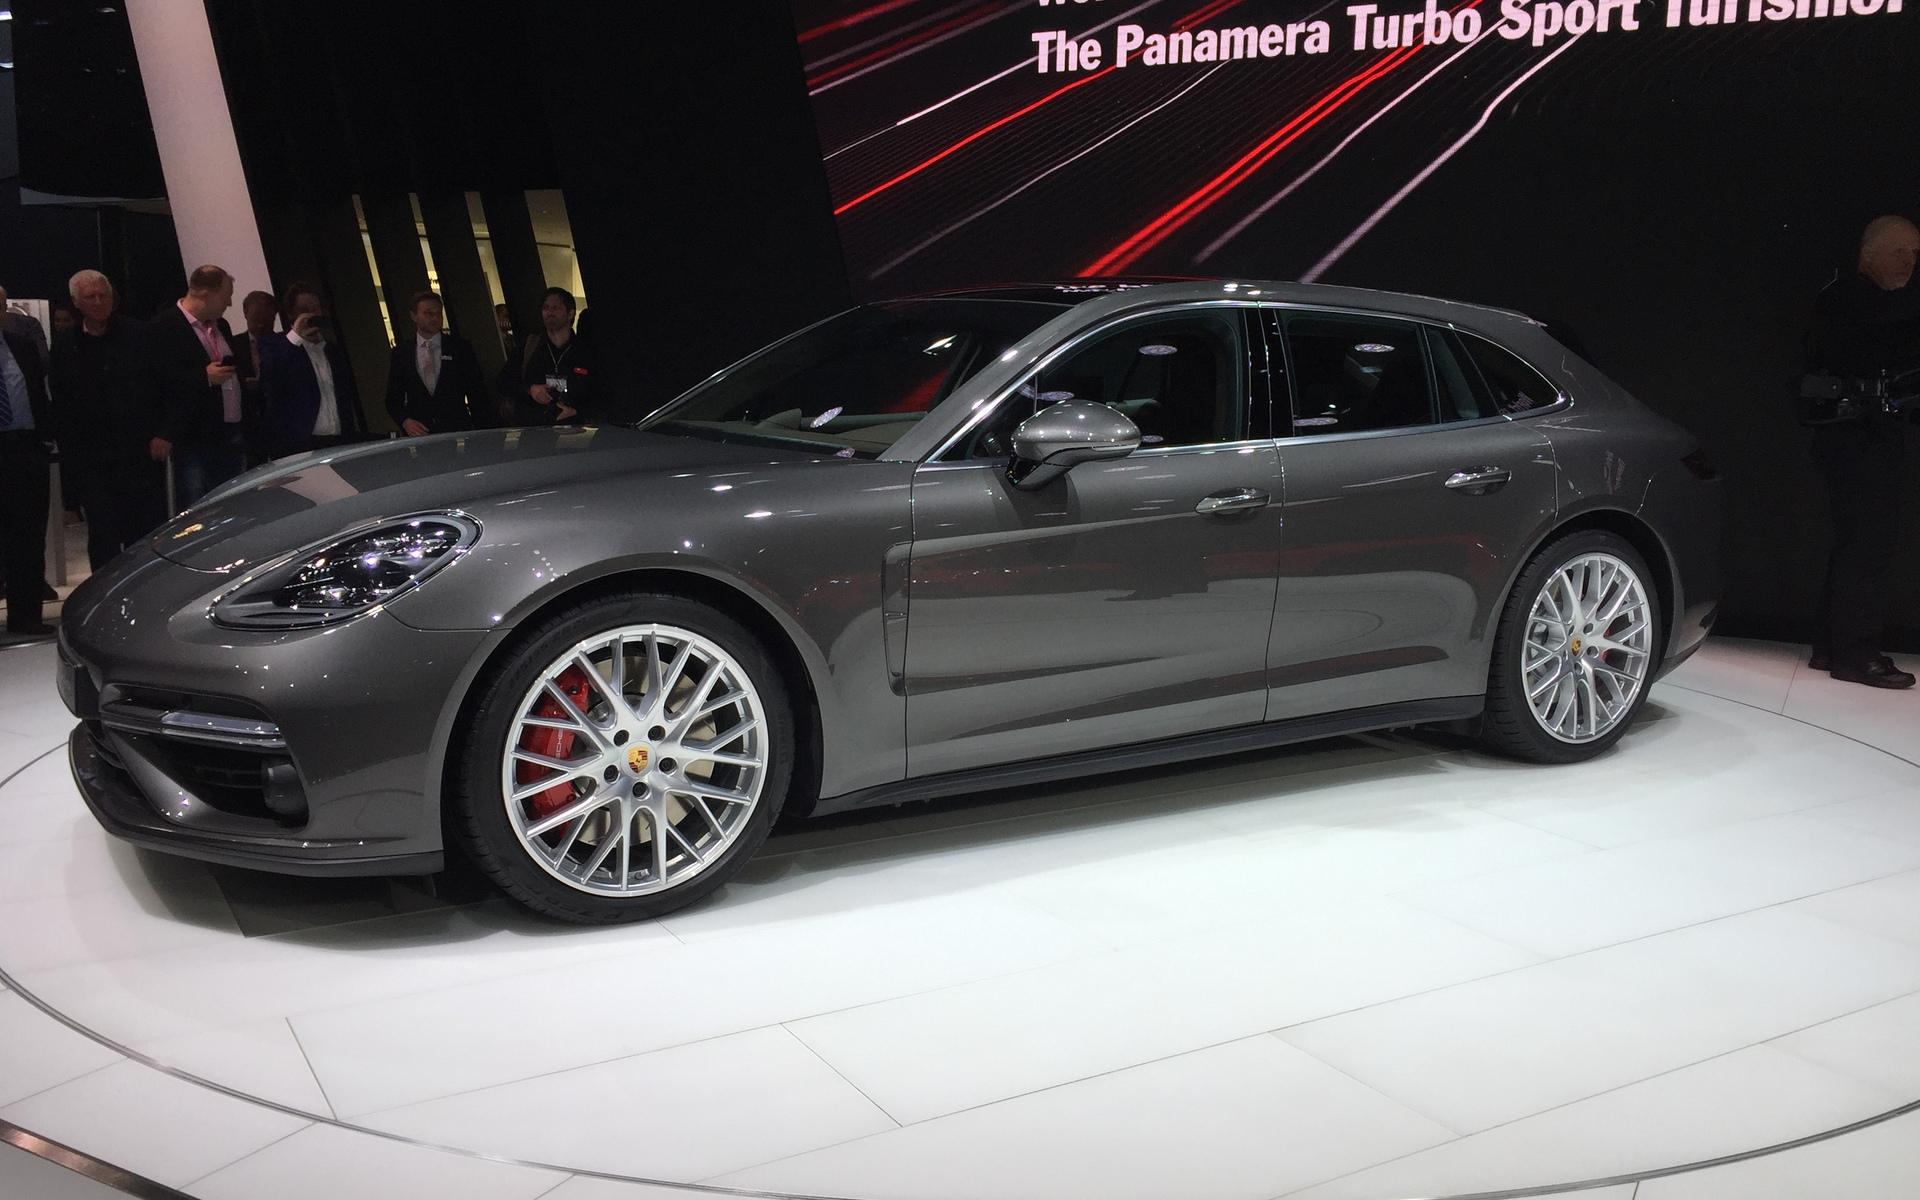 2018 Porsche Panamera Sport Turismo The Wagon Variant 4 17